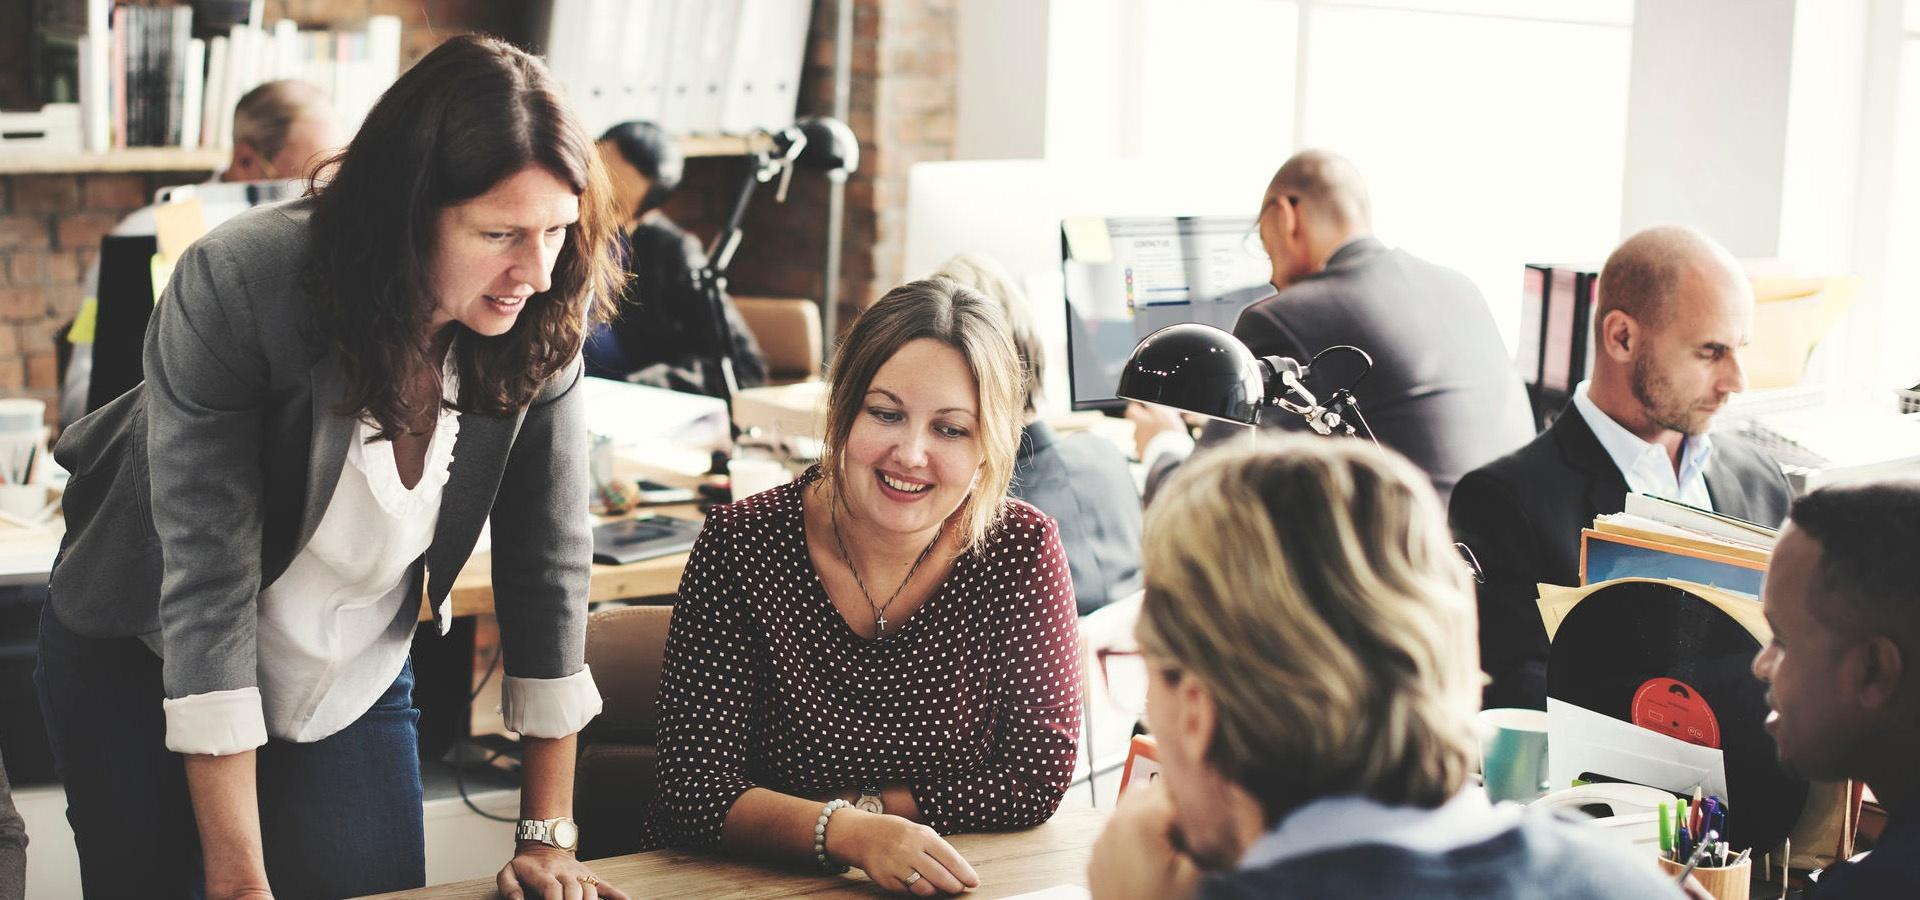 business-people-meeting